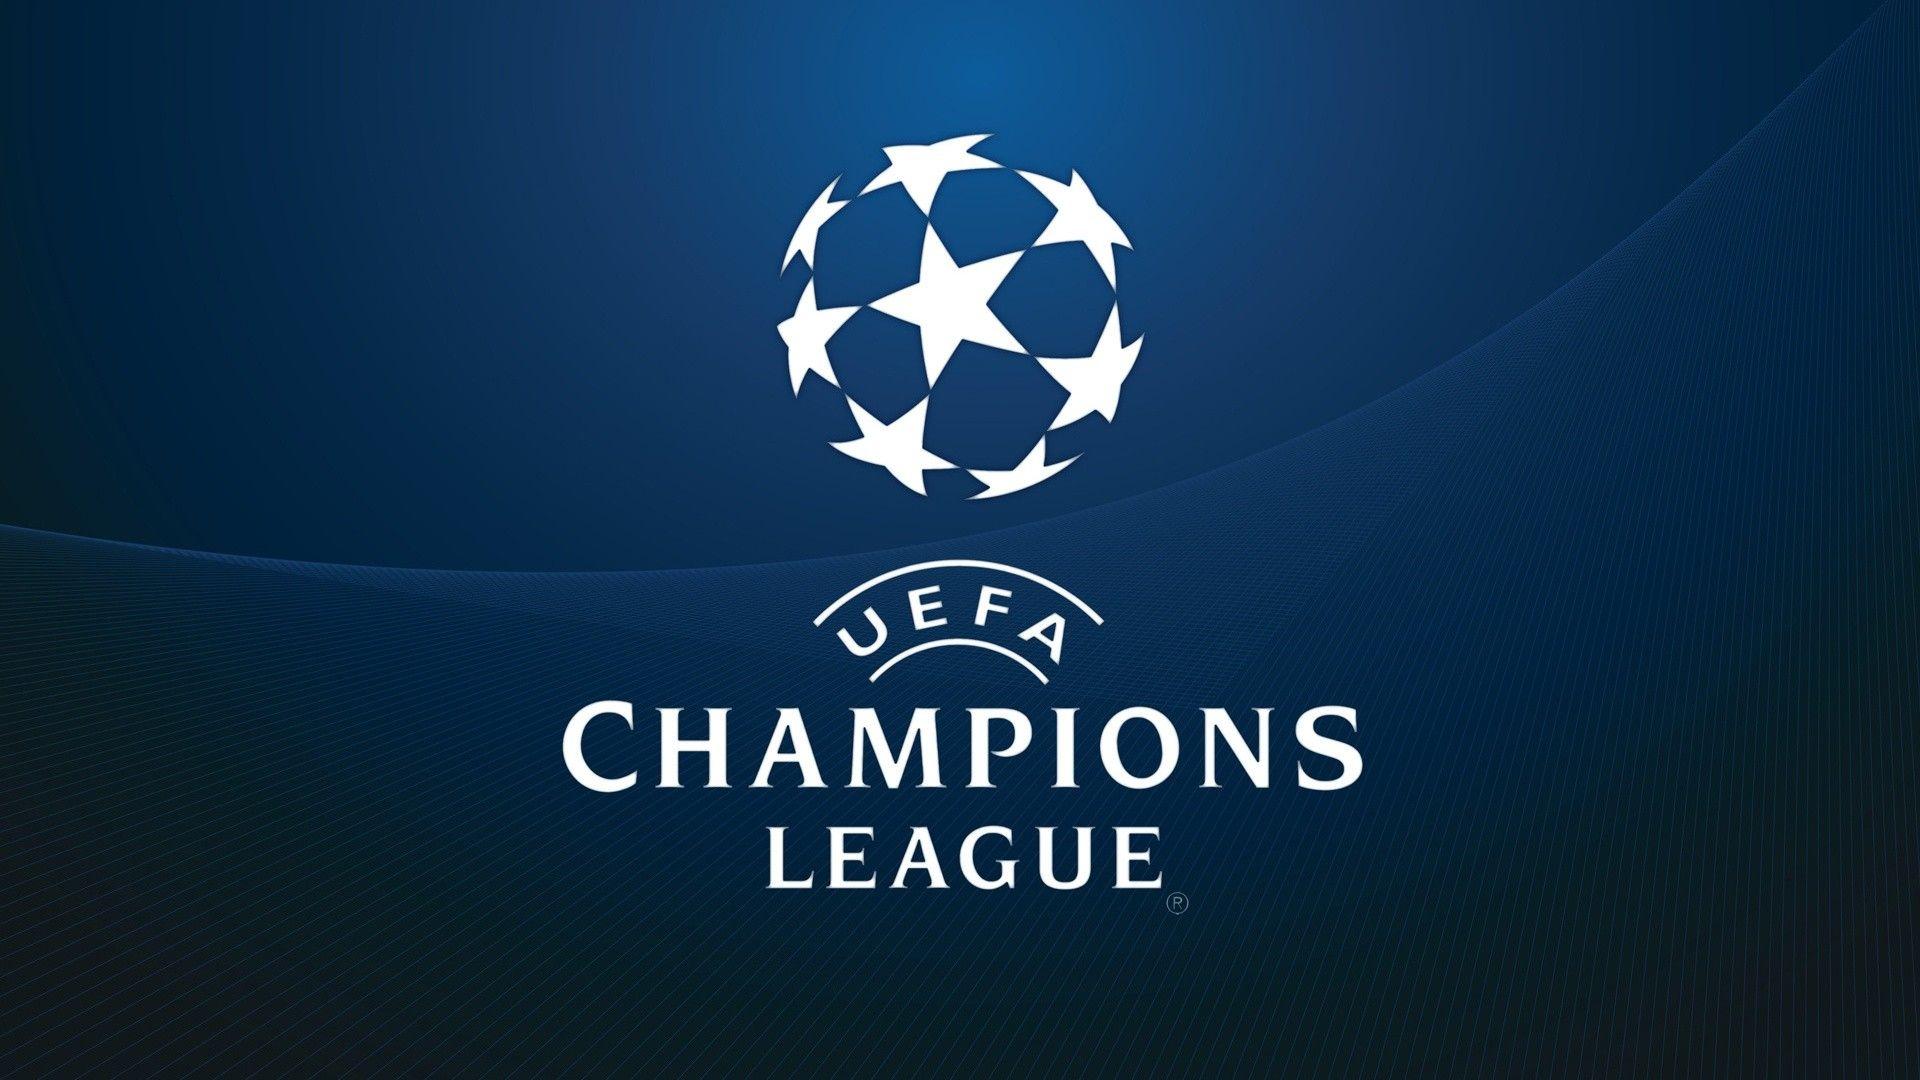 UEFA Champions League Logo